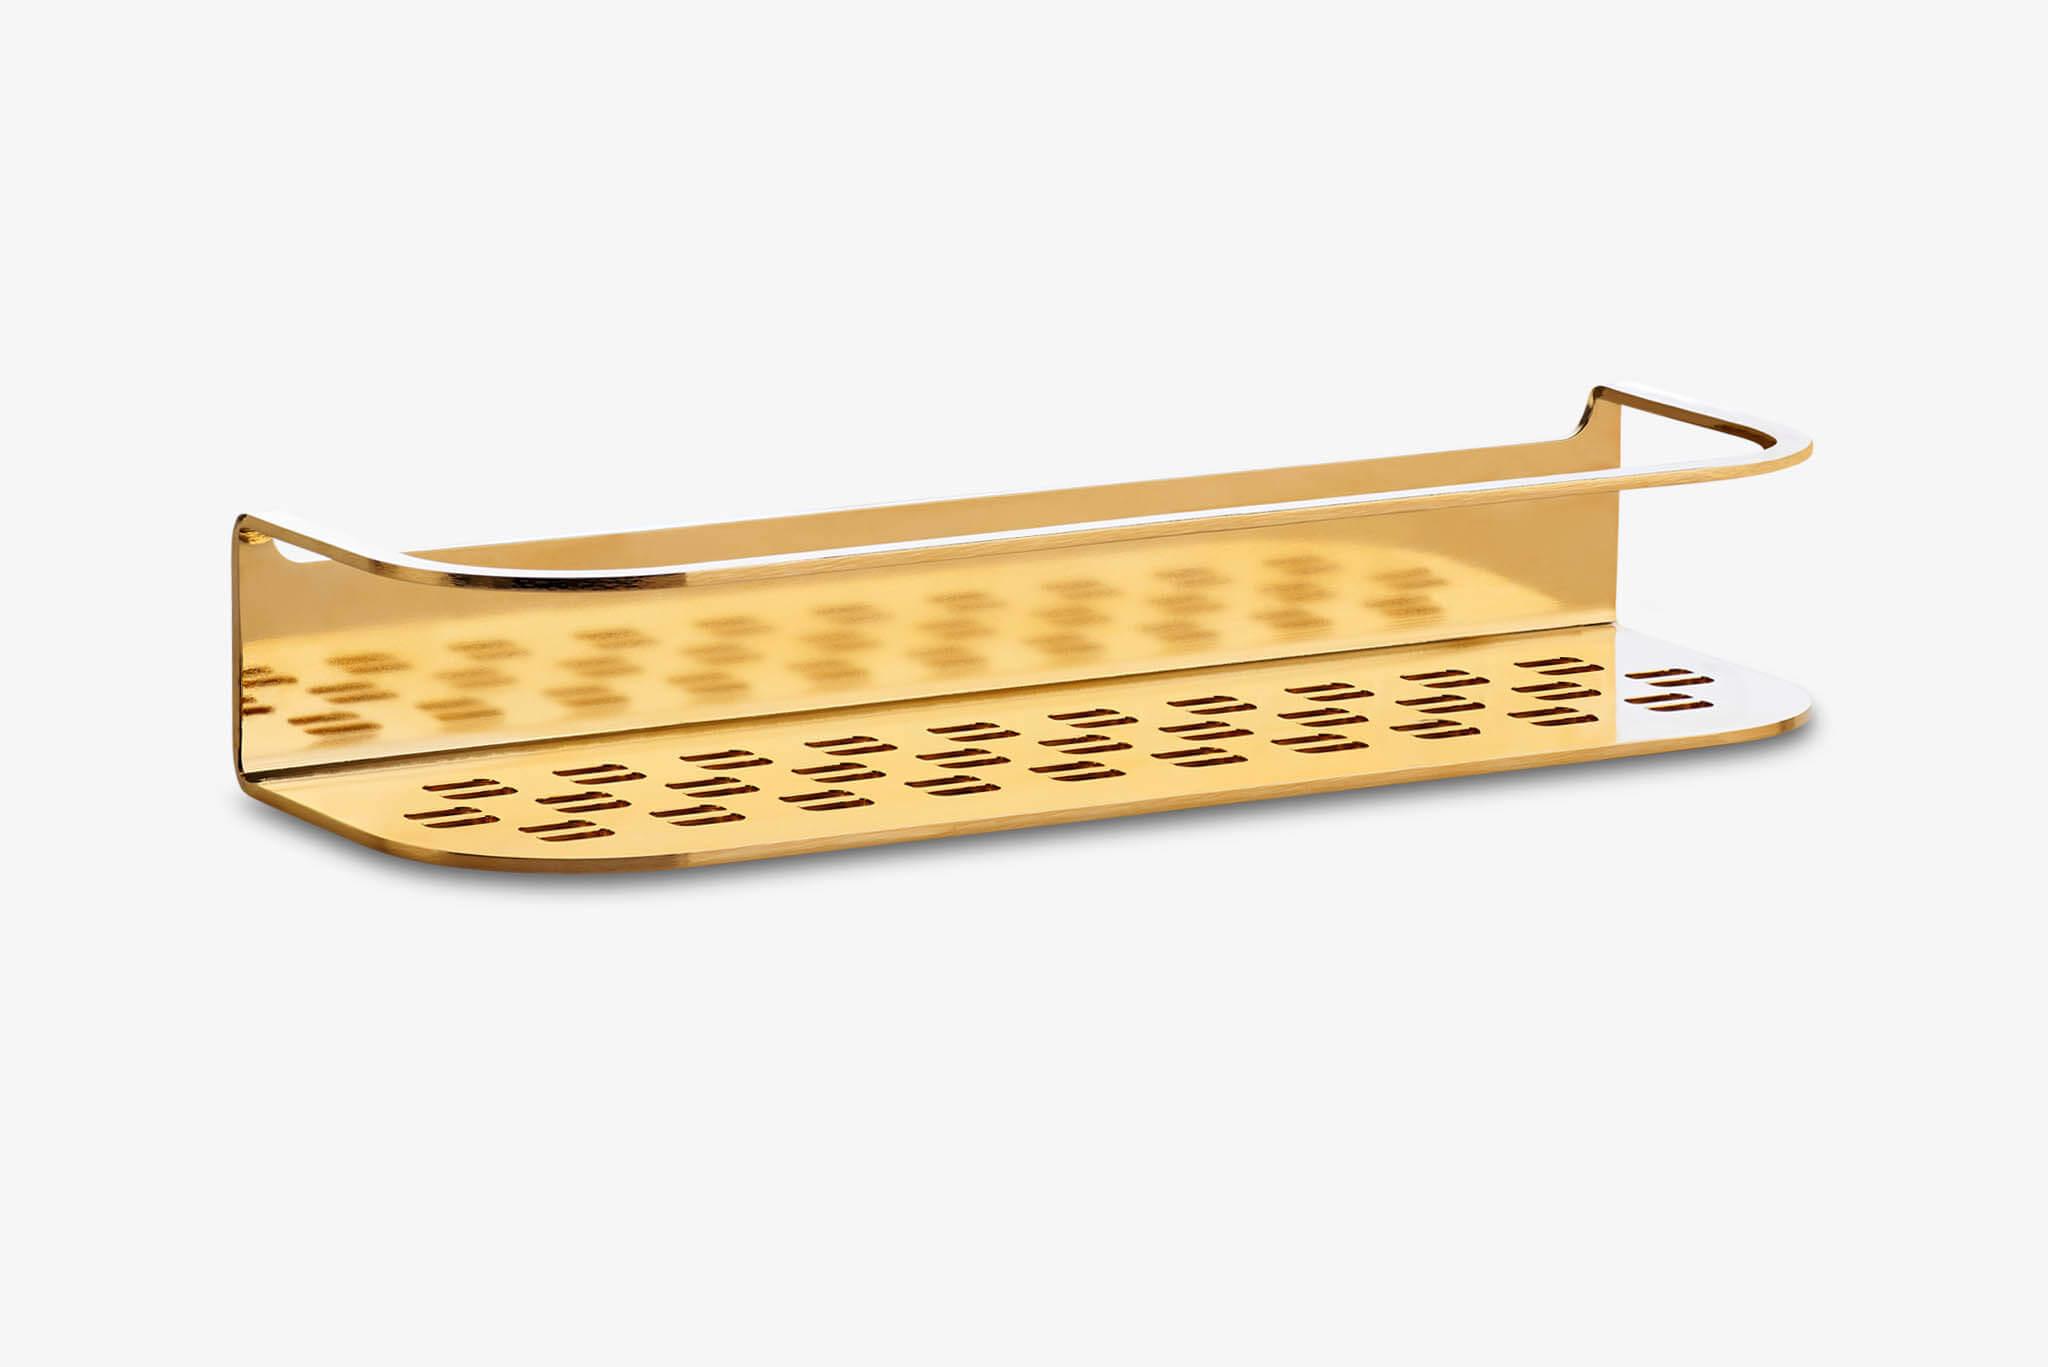 Shower Shelf 300x100x53 Gold Plated (ID.1049)